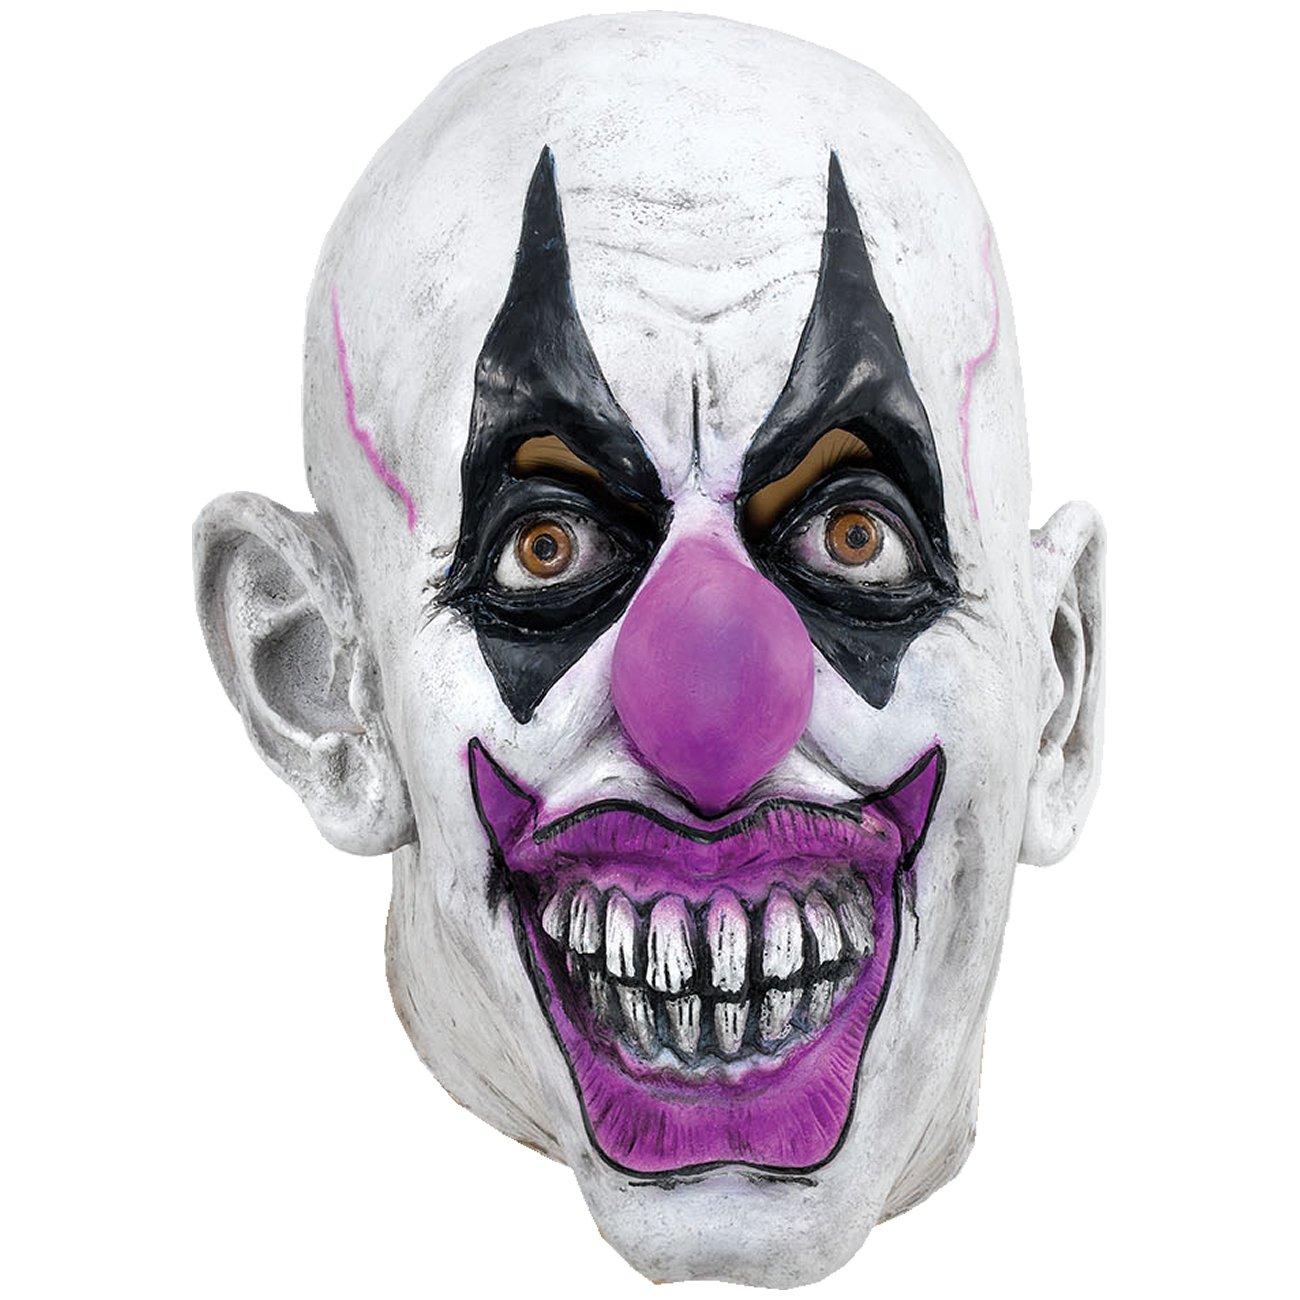 Unbekannt Vollmaske verrückter Clown Clownsmaske Clownmaske Maske NoName